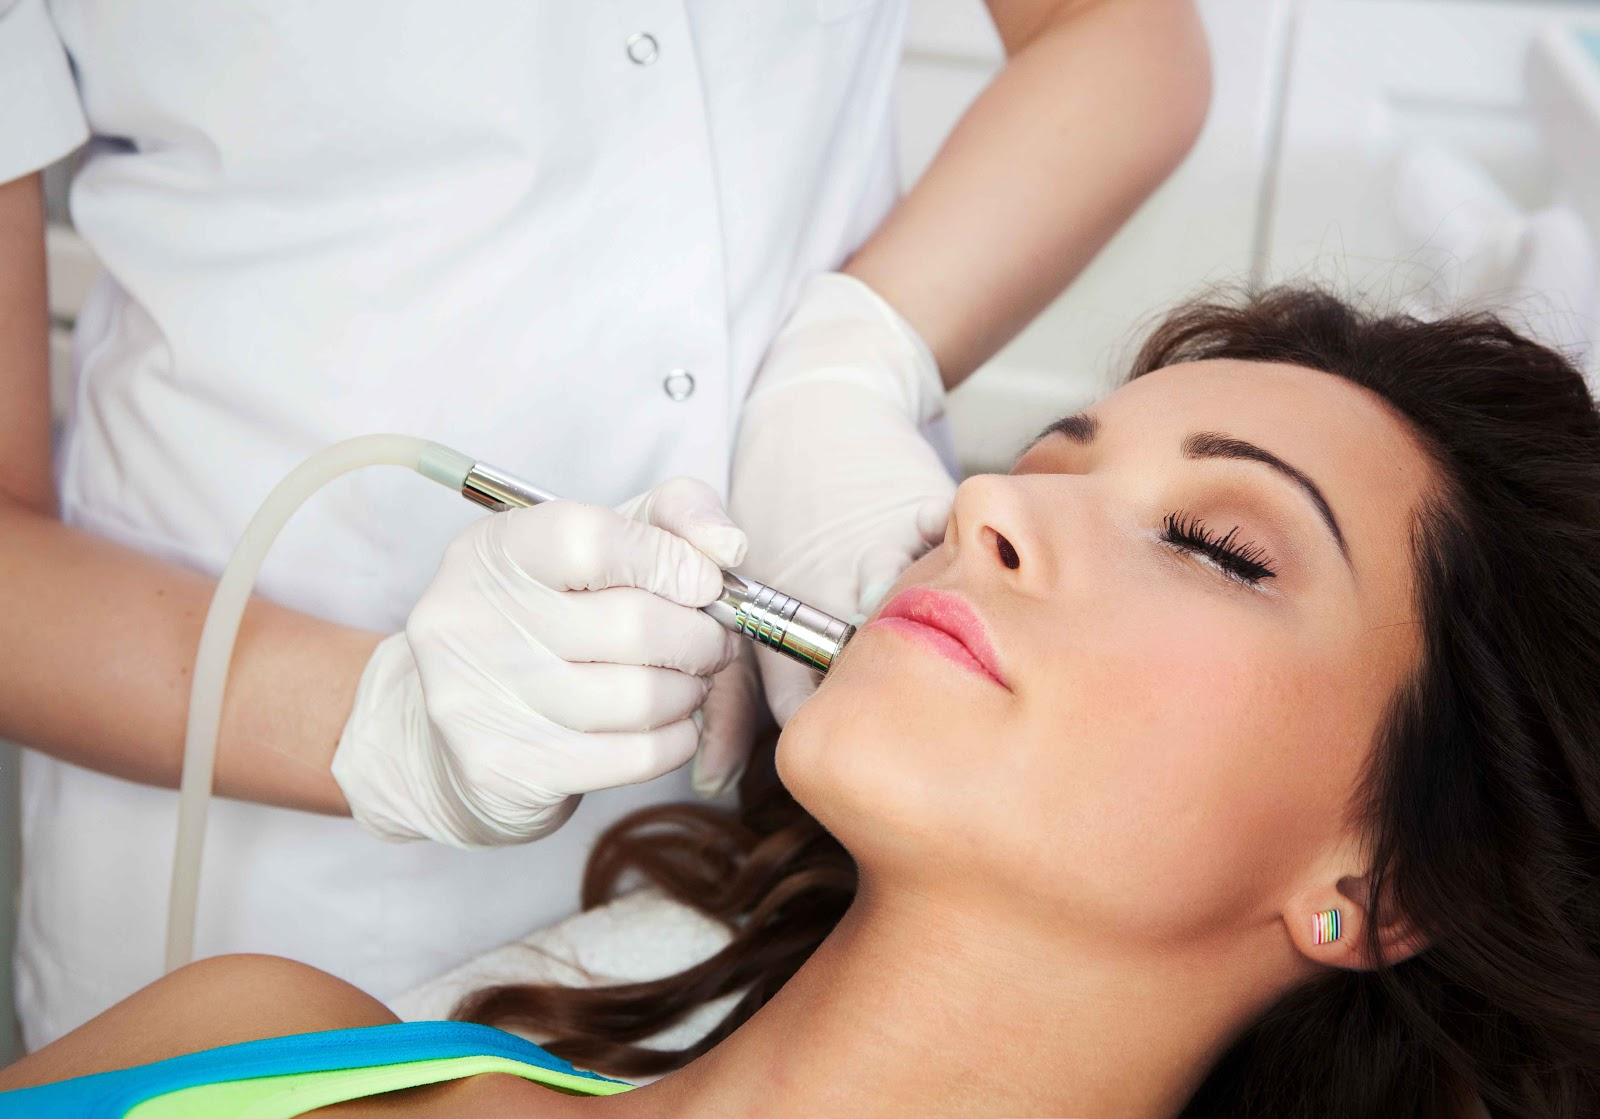 jenis macam perawatan treatment salon kecantikan beauty kapster plus pijat massage pengertian definisi arti